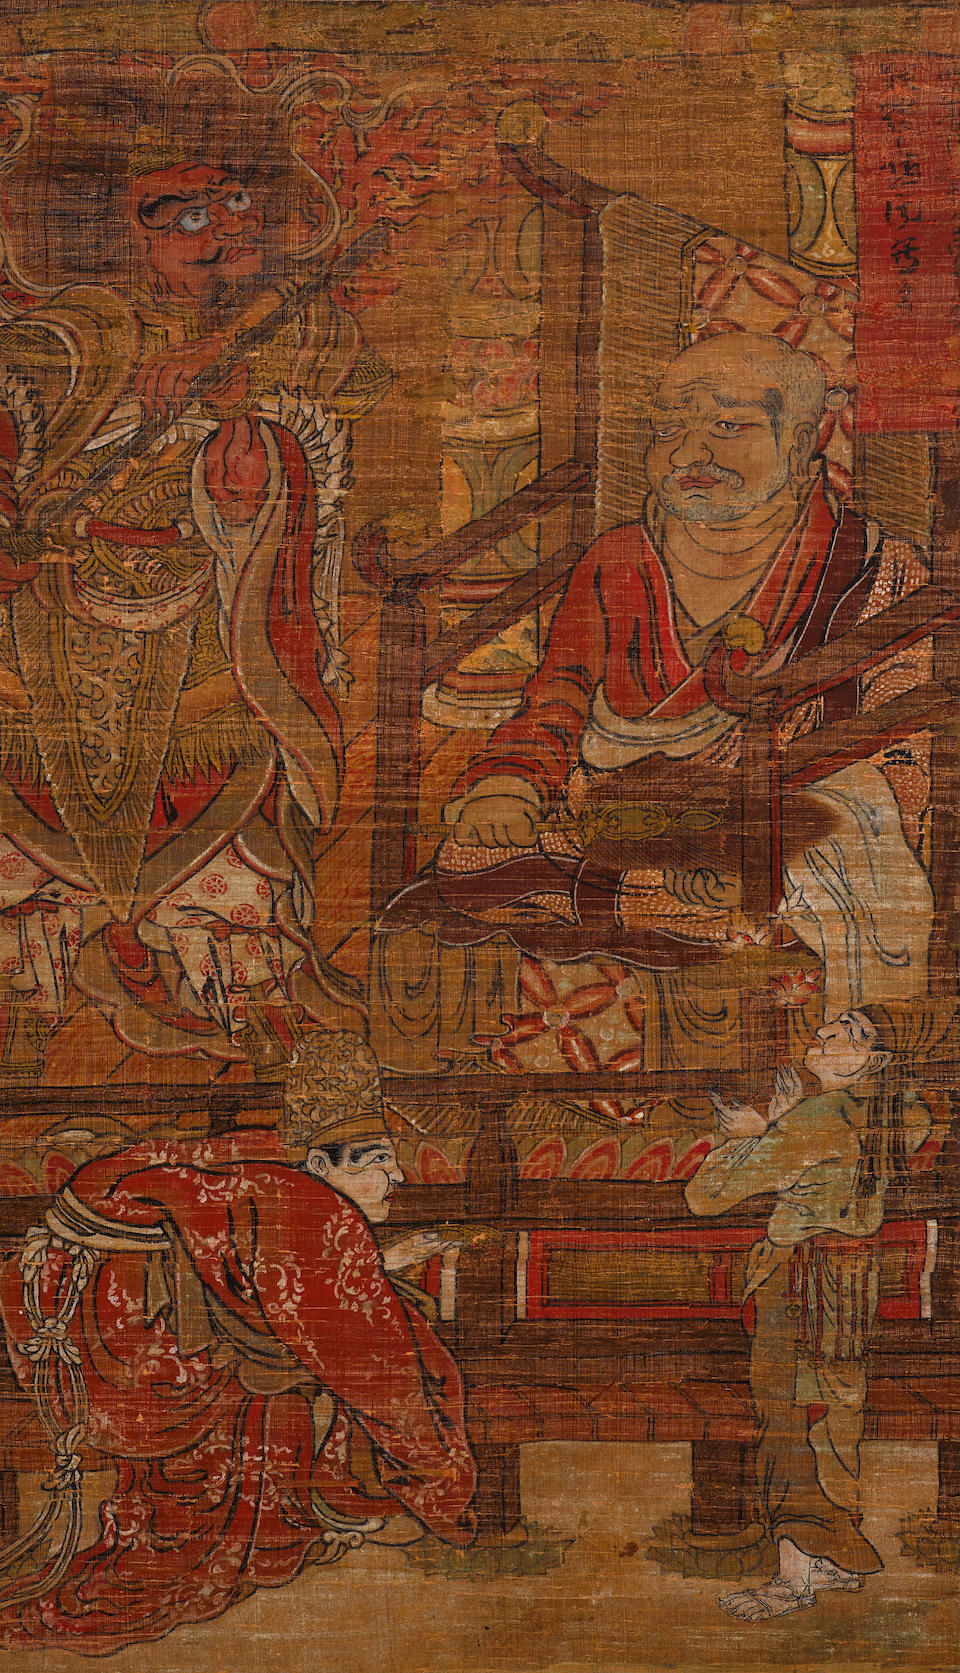 Bonhams : A set of 16 hanging scrolls of Rakan Japanese